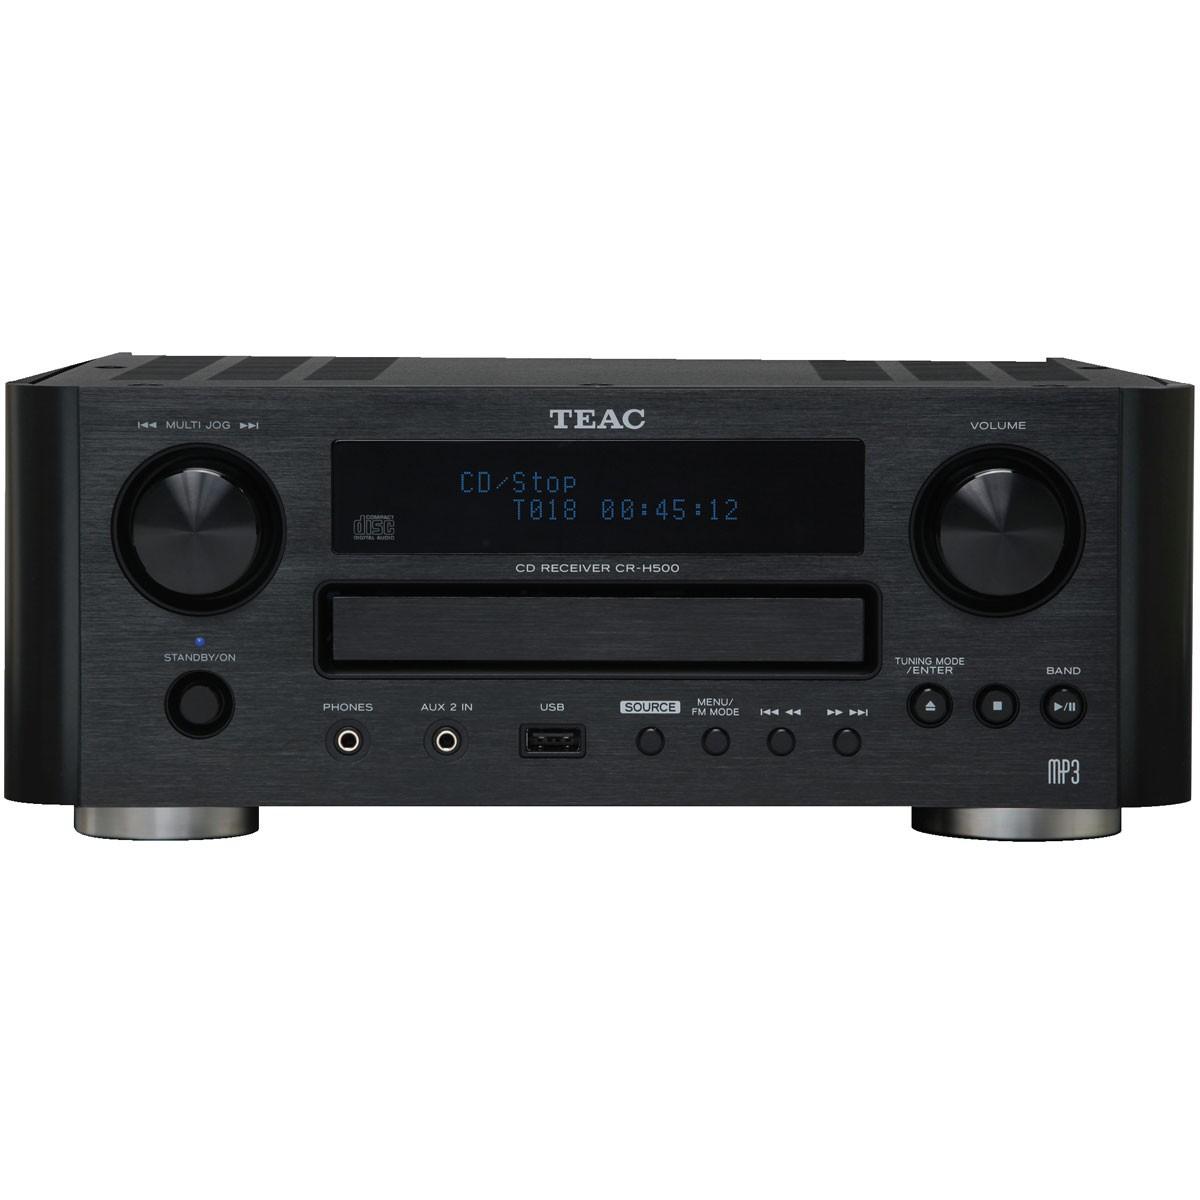 Chaîne hi-fi compacte TEAC CR-H500 avec CD, tuner, et interface USB/Apple